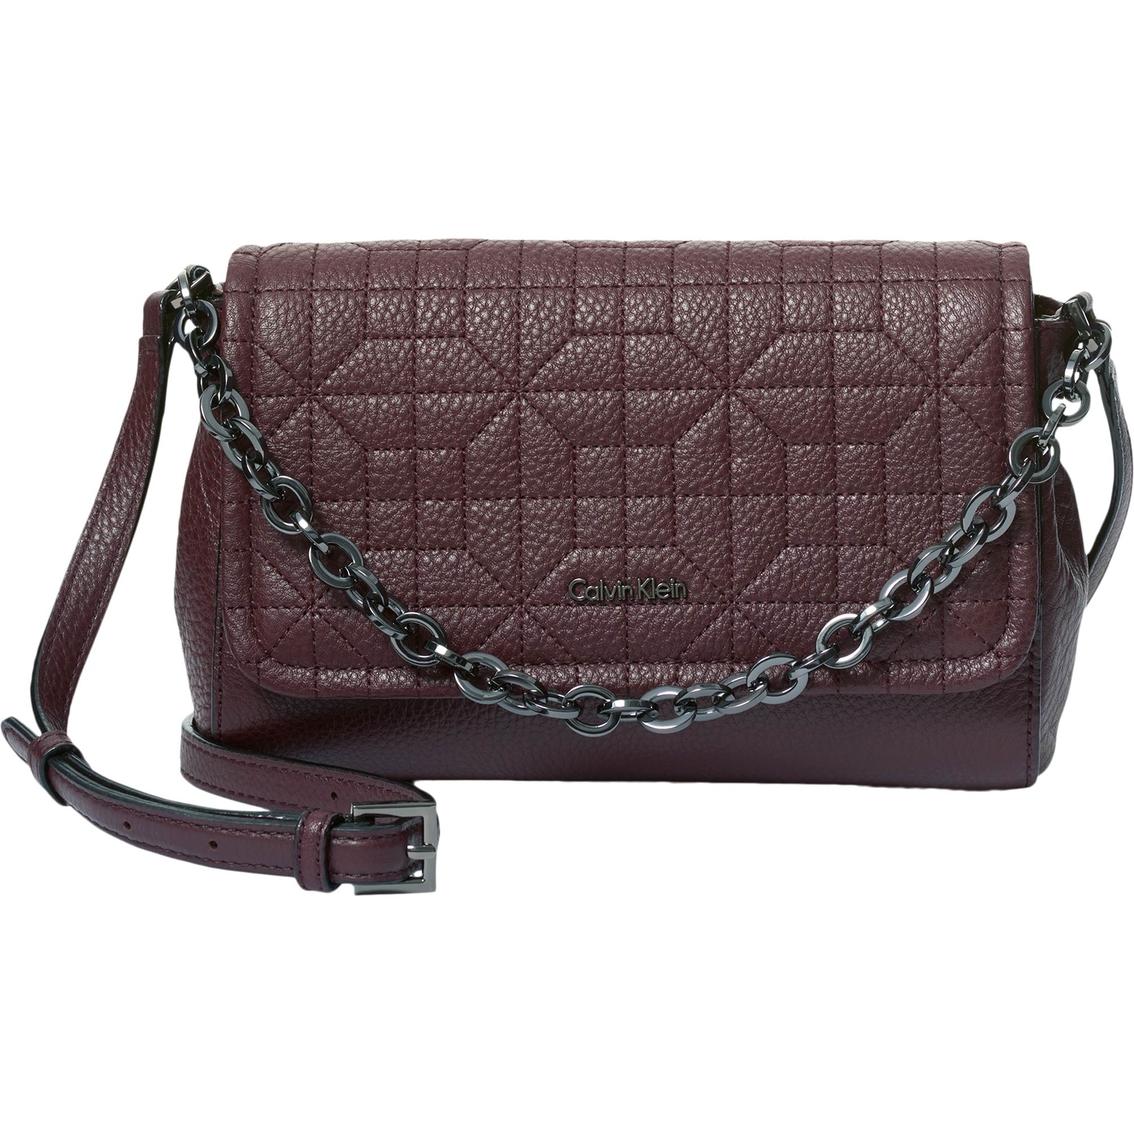 Calvin Klein Hera Quilted Pebble Leather Crossbody Handbag